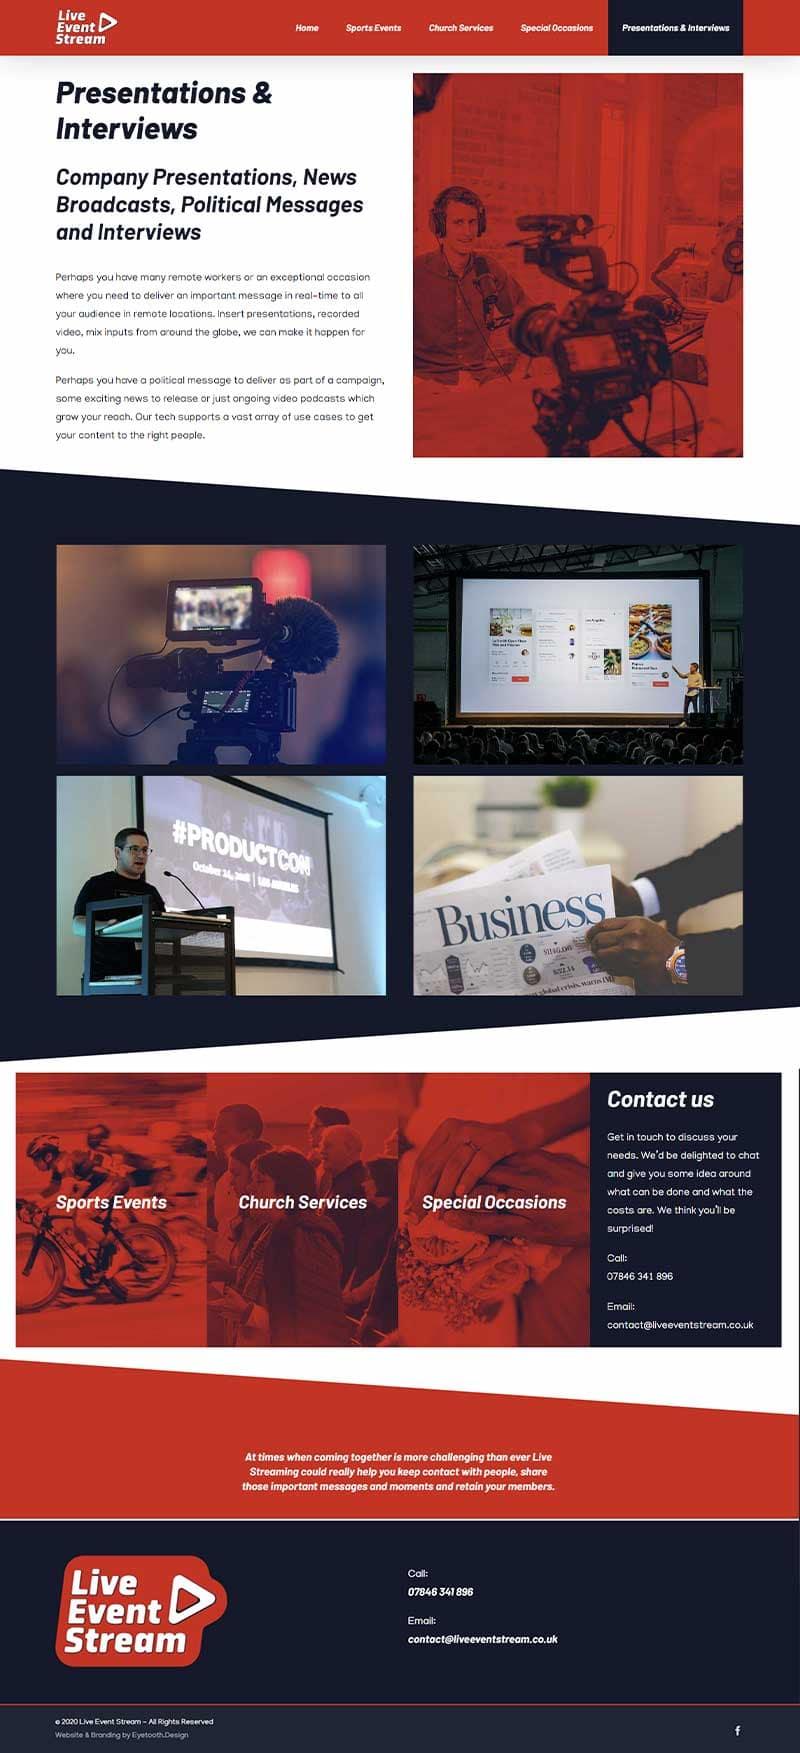 Presentation LiveStream Service Webpage Design